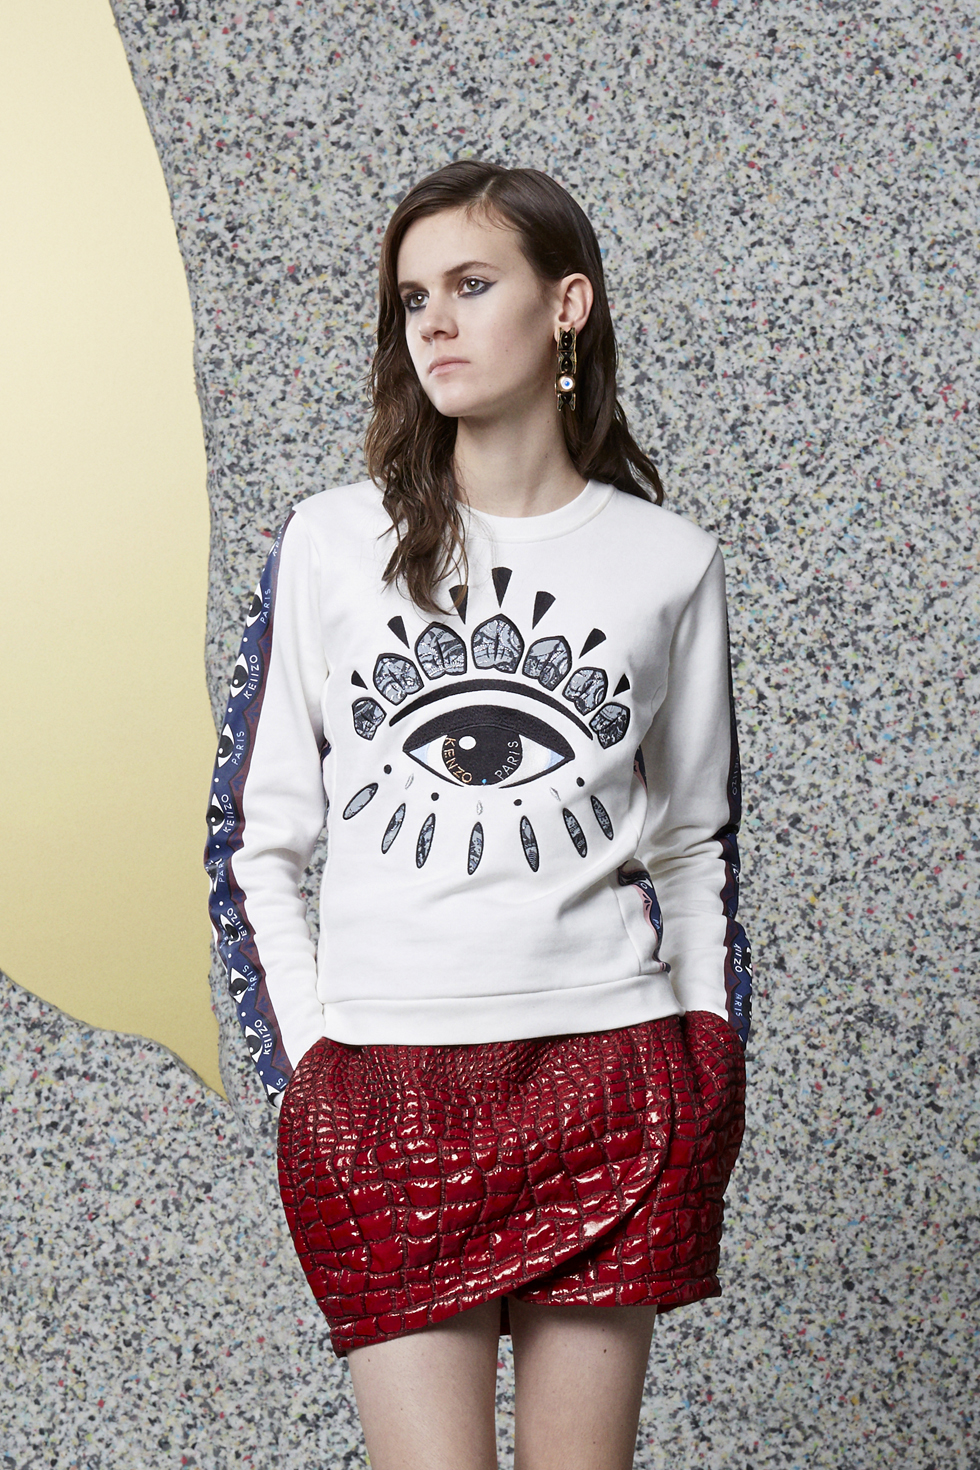 Sweatshirt Eye  Kenzo - Sweat-shirts & Pulls Kenzo Femme - E-Shop Kenzo | Kenzo.com